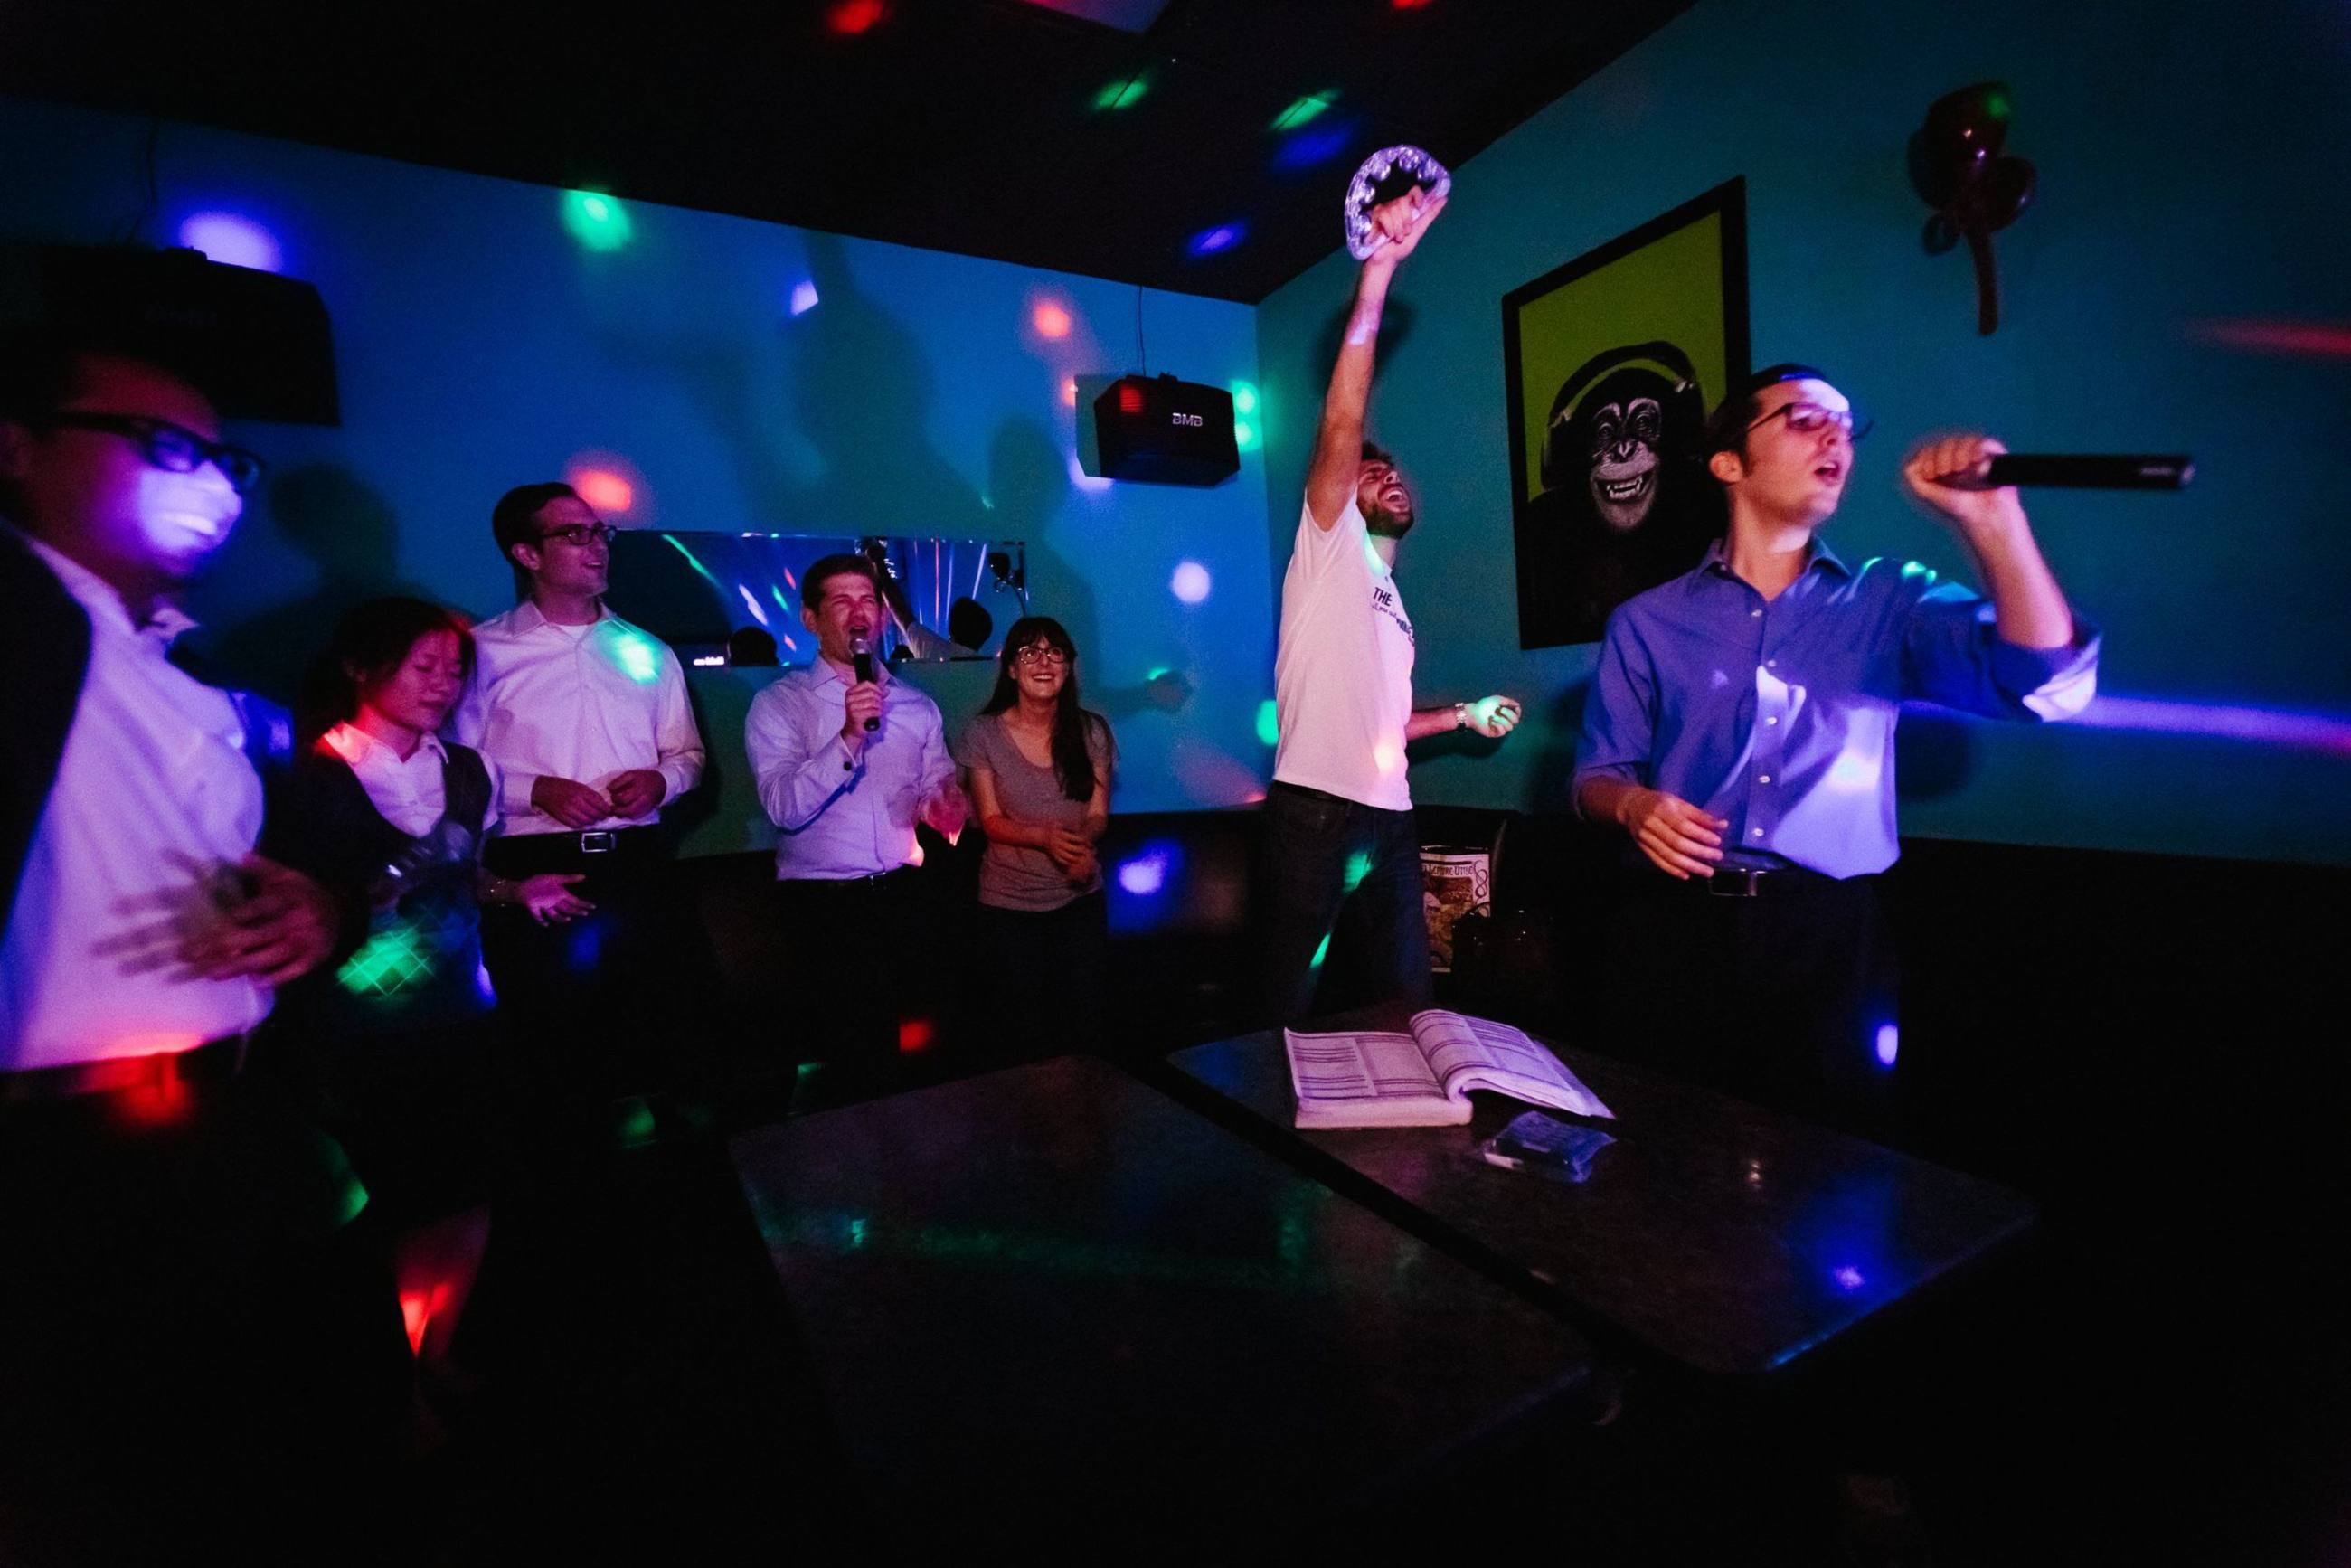 Max Karaoke Studio